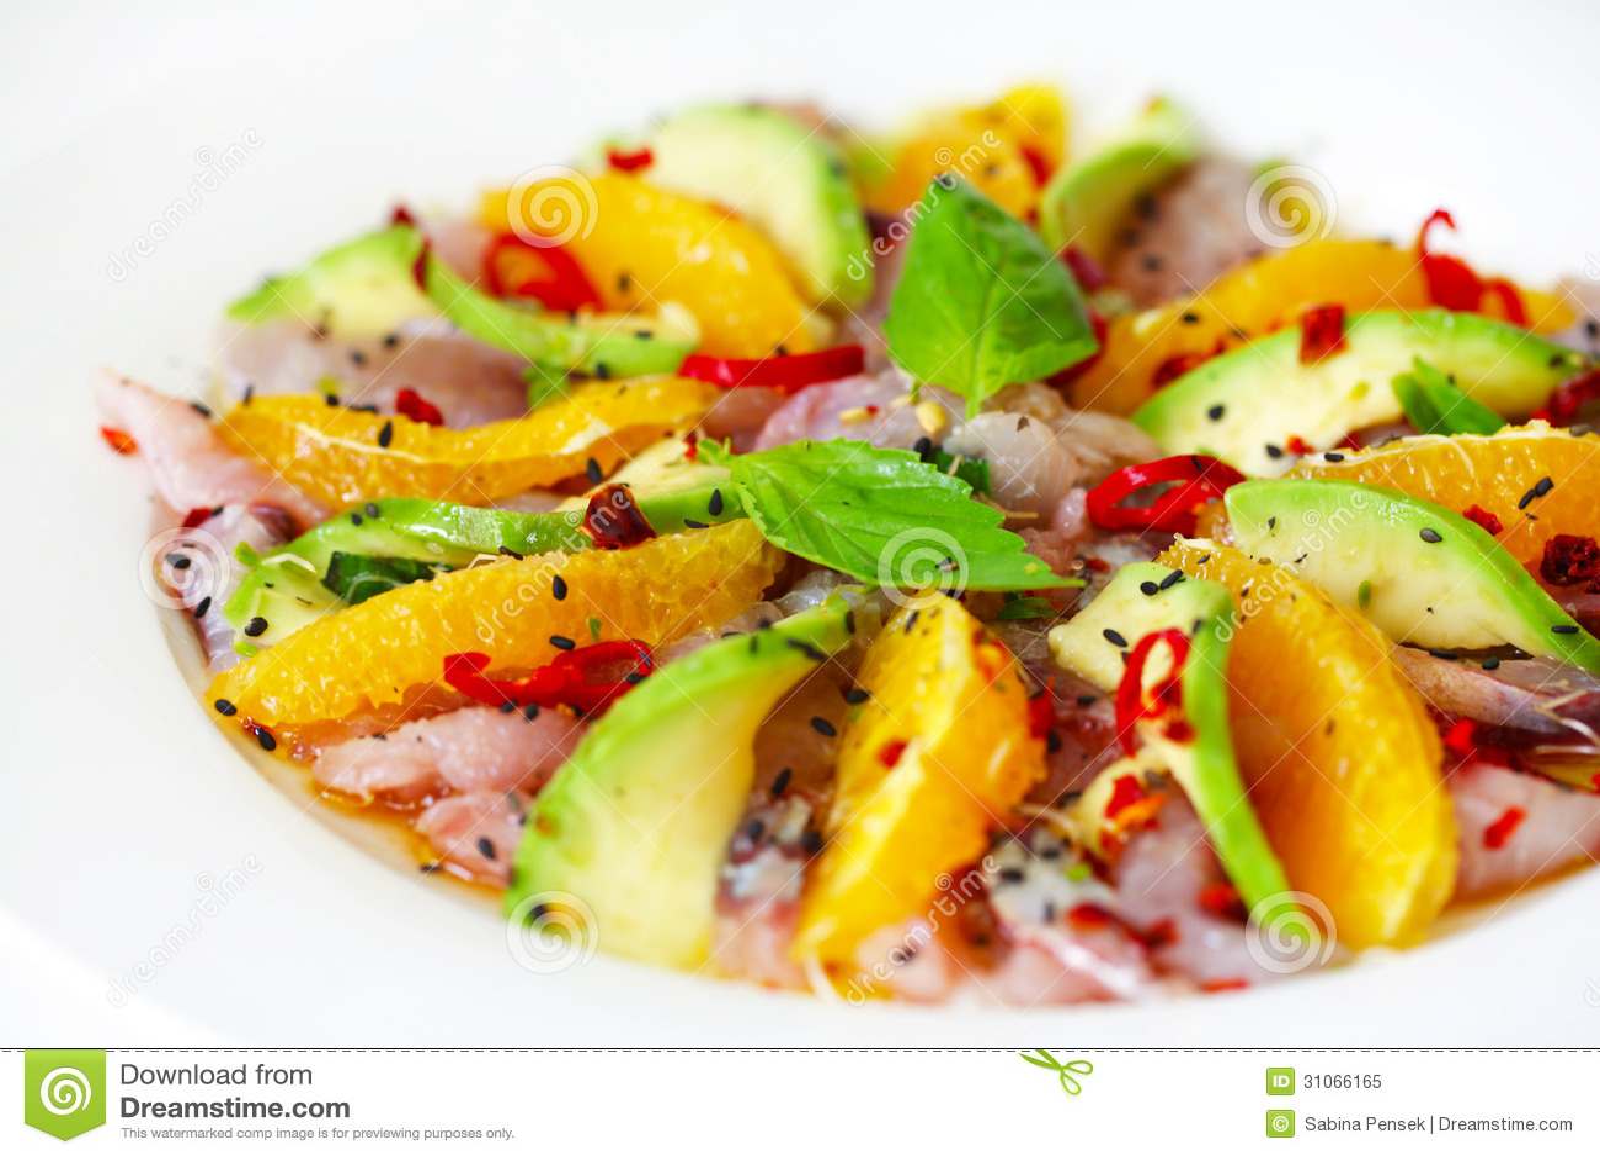 Carpaccio de salade de poisson cru avec l 39 avocat et les for Salade pour accompagner poisson